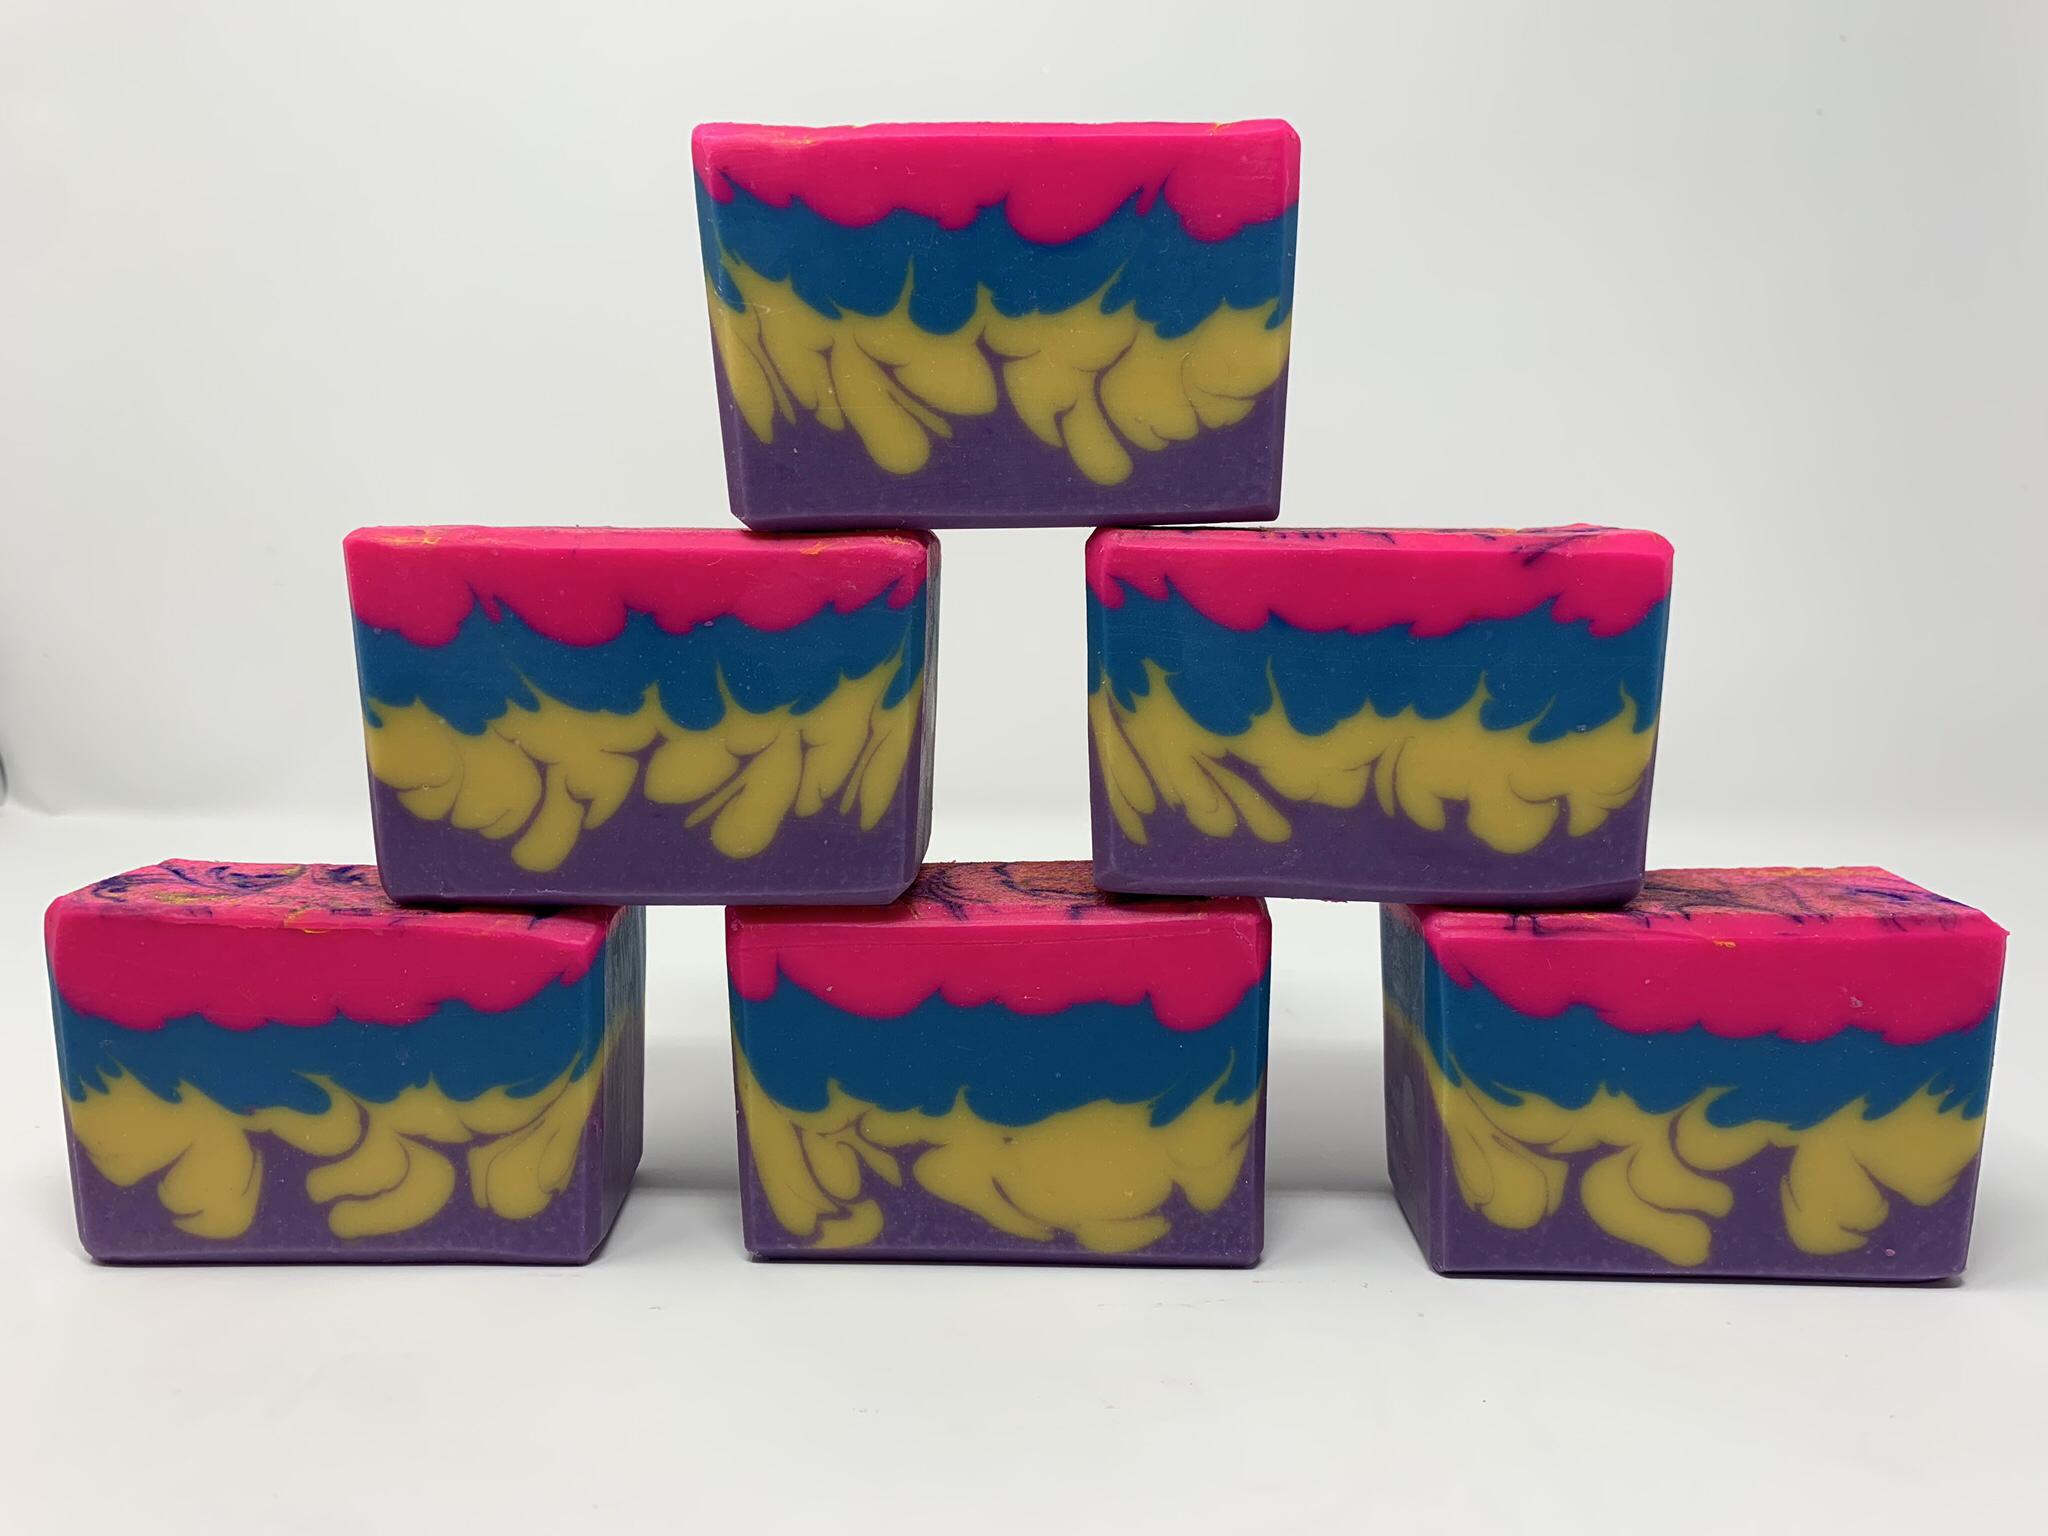 jasmine rsquo s dream soap